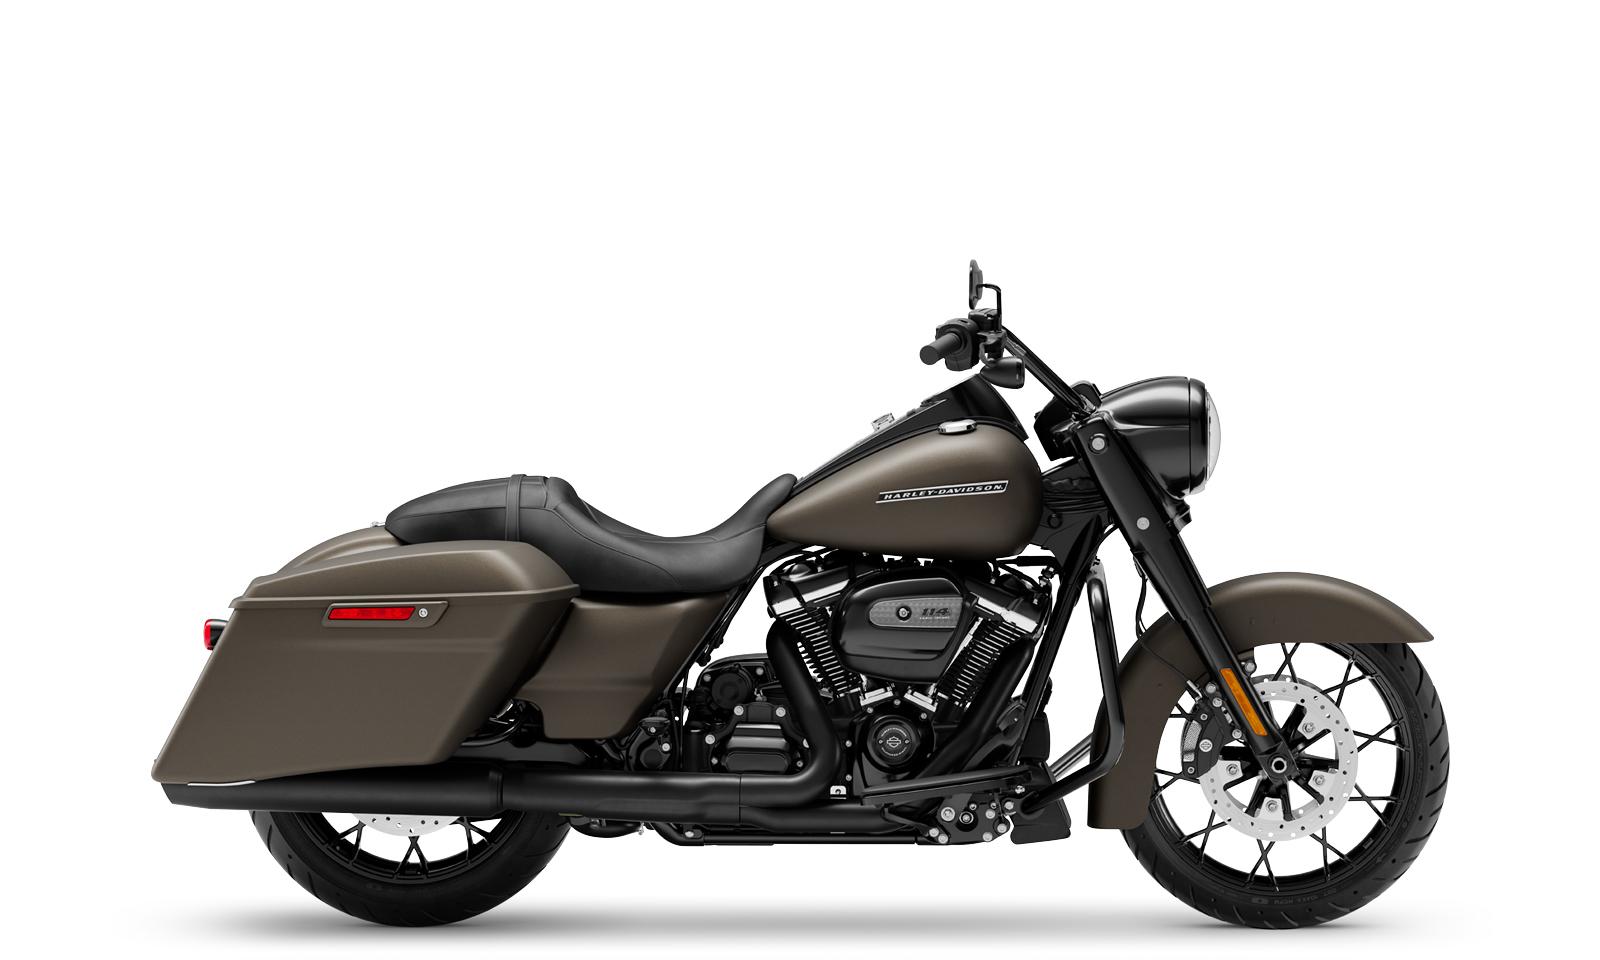 2020 Road King Special Motorcycle Harley Davidson Brasil